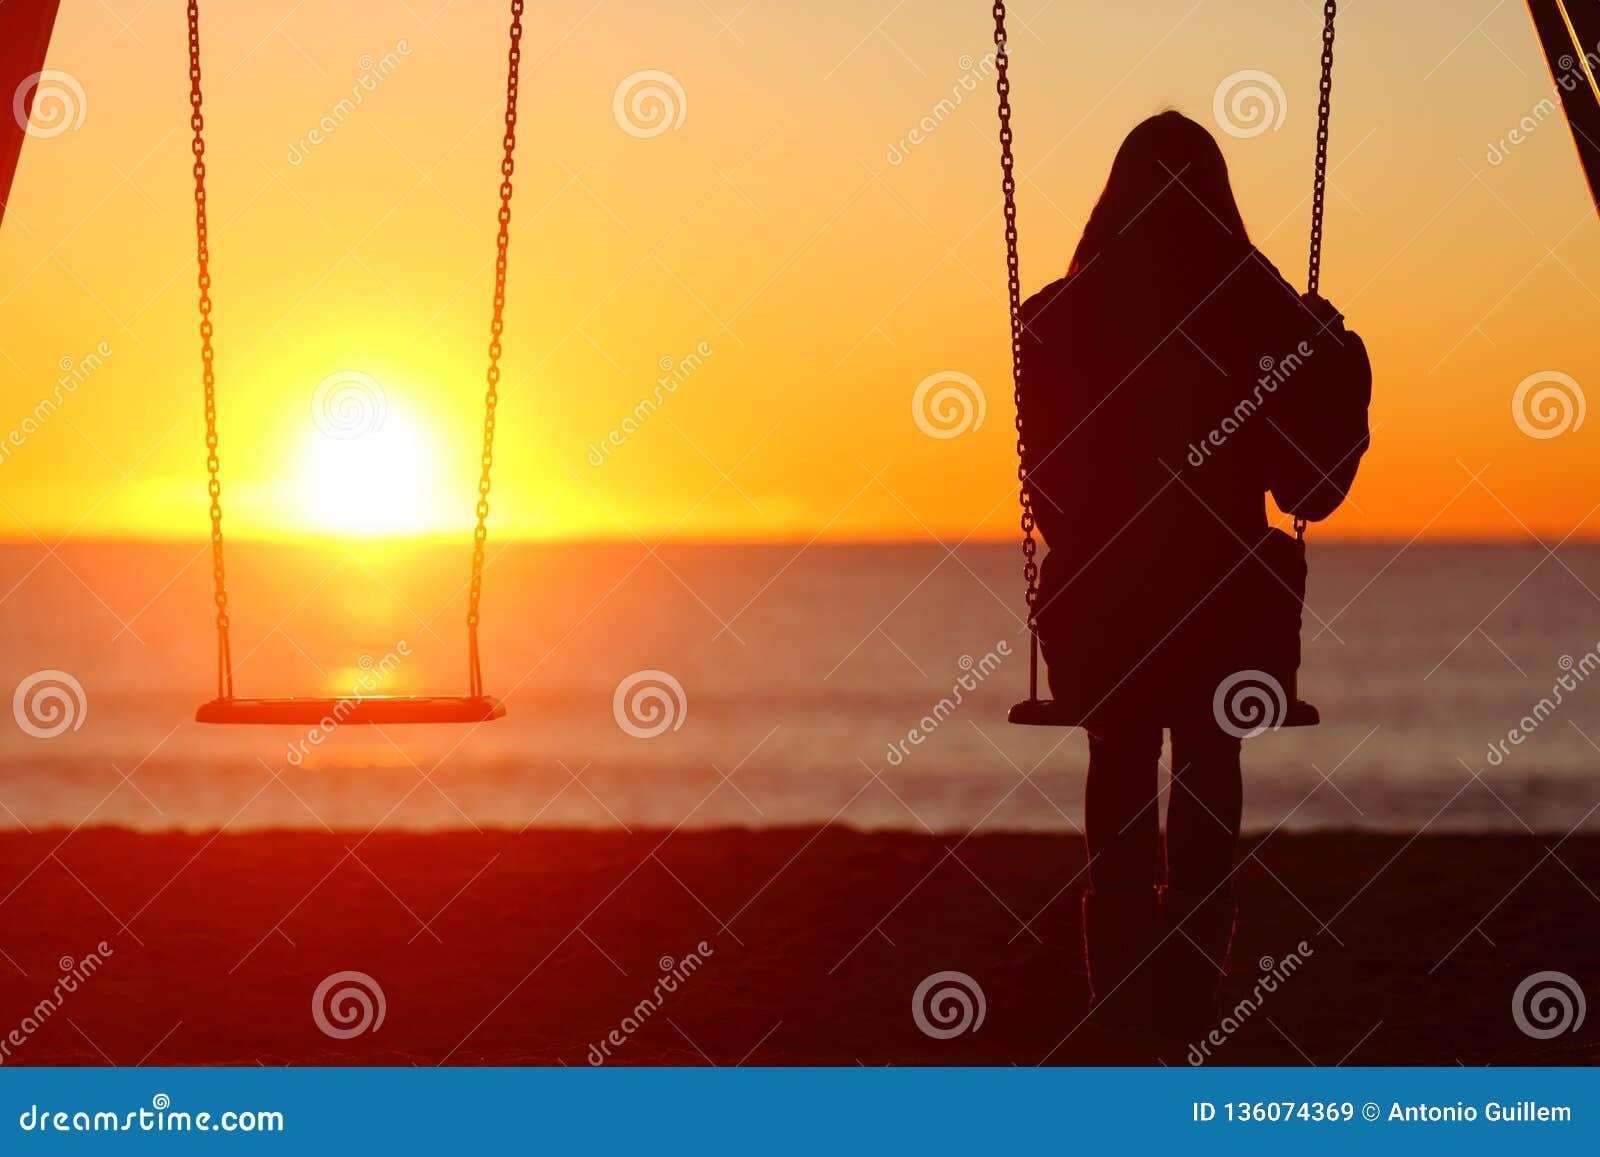 Single woman sitting on a swing contemplating sunset